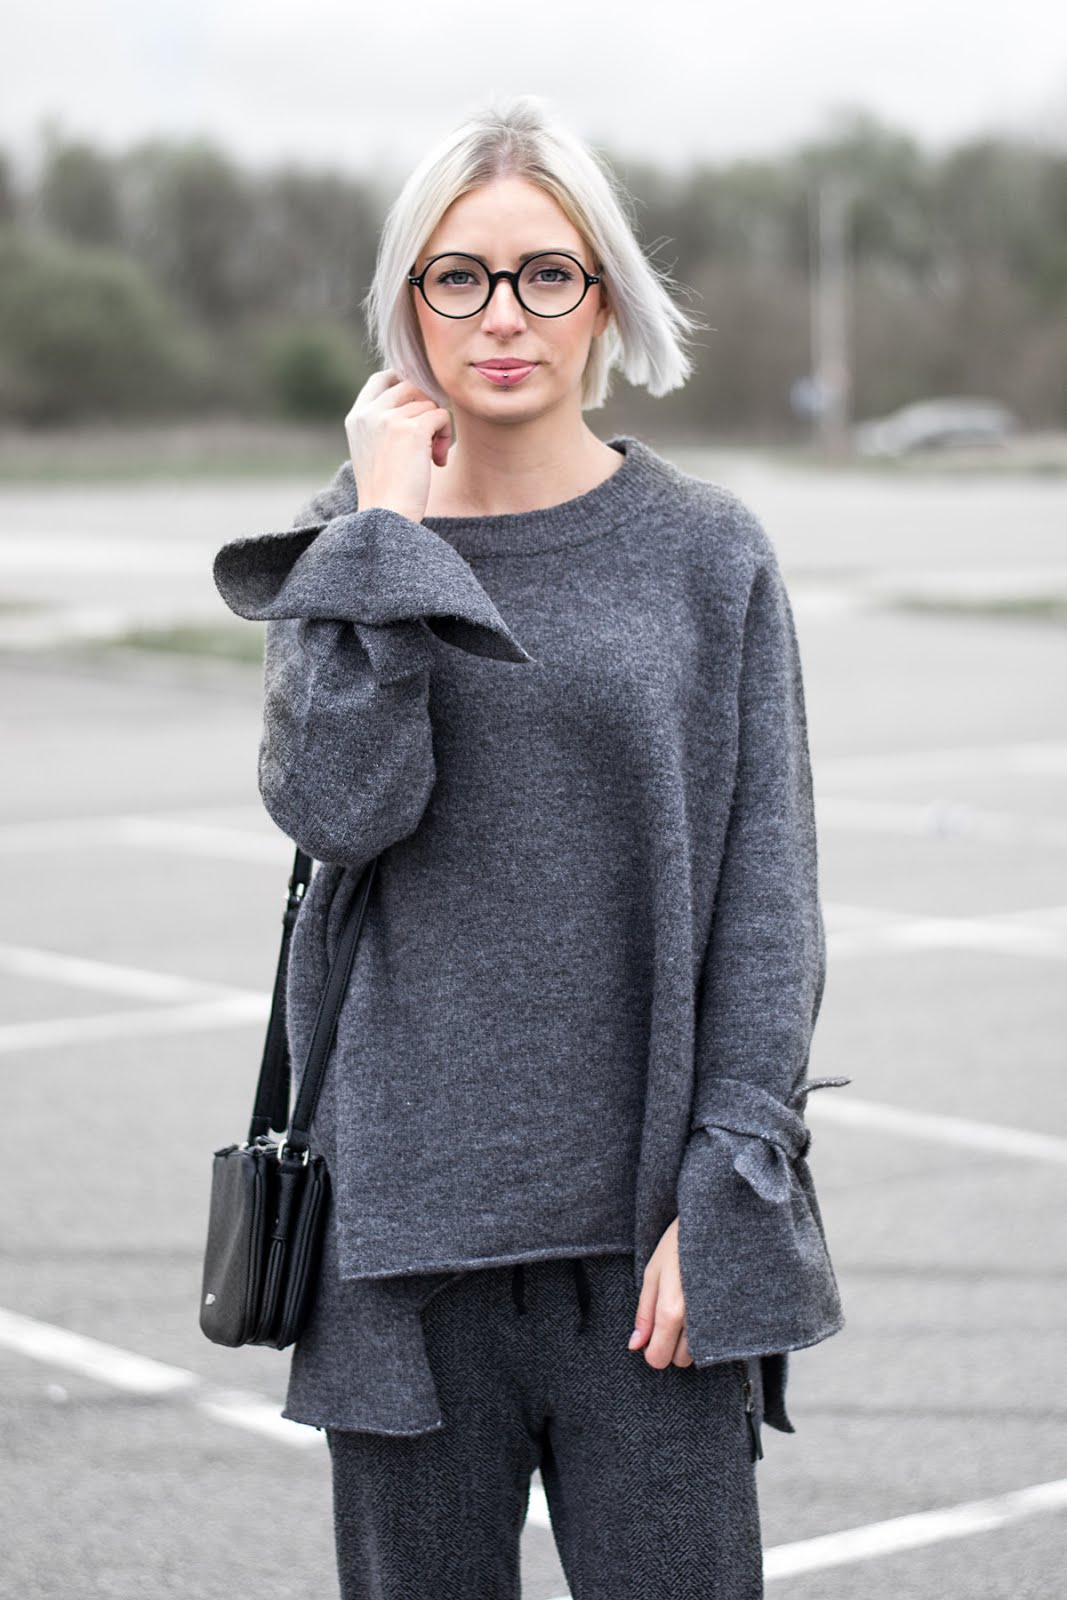 SS17, wool, knitted, outfit, zara, grey, minimal, round glasses, firmoo, liu jo, duifhuizen tassen & koffers